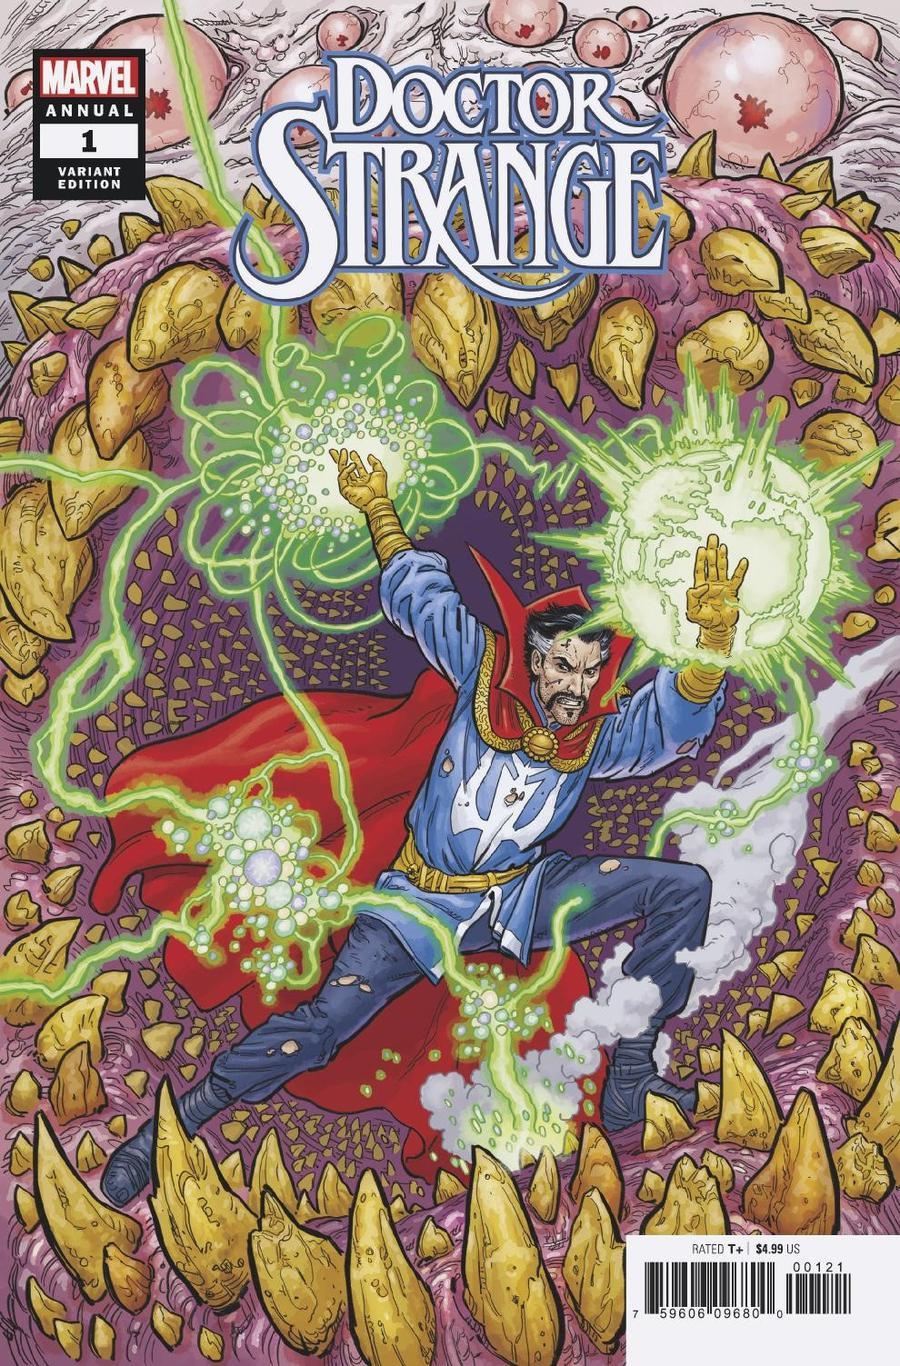 Doctor Strange Vol 5 Annual #1 Cover B Variant Steve Skroce Cover